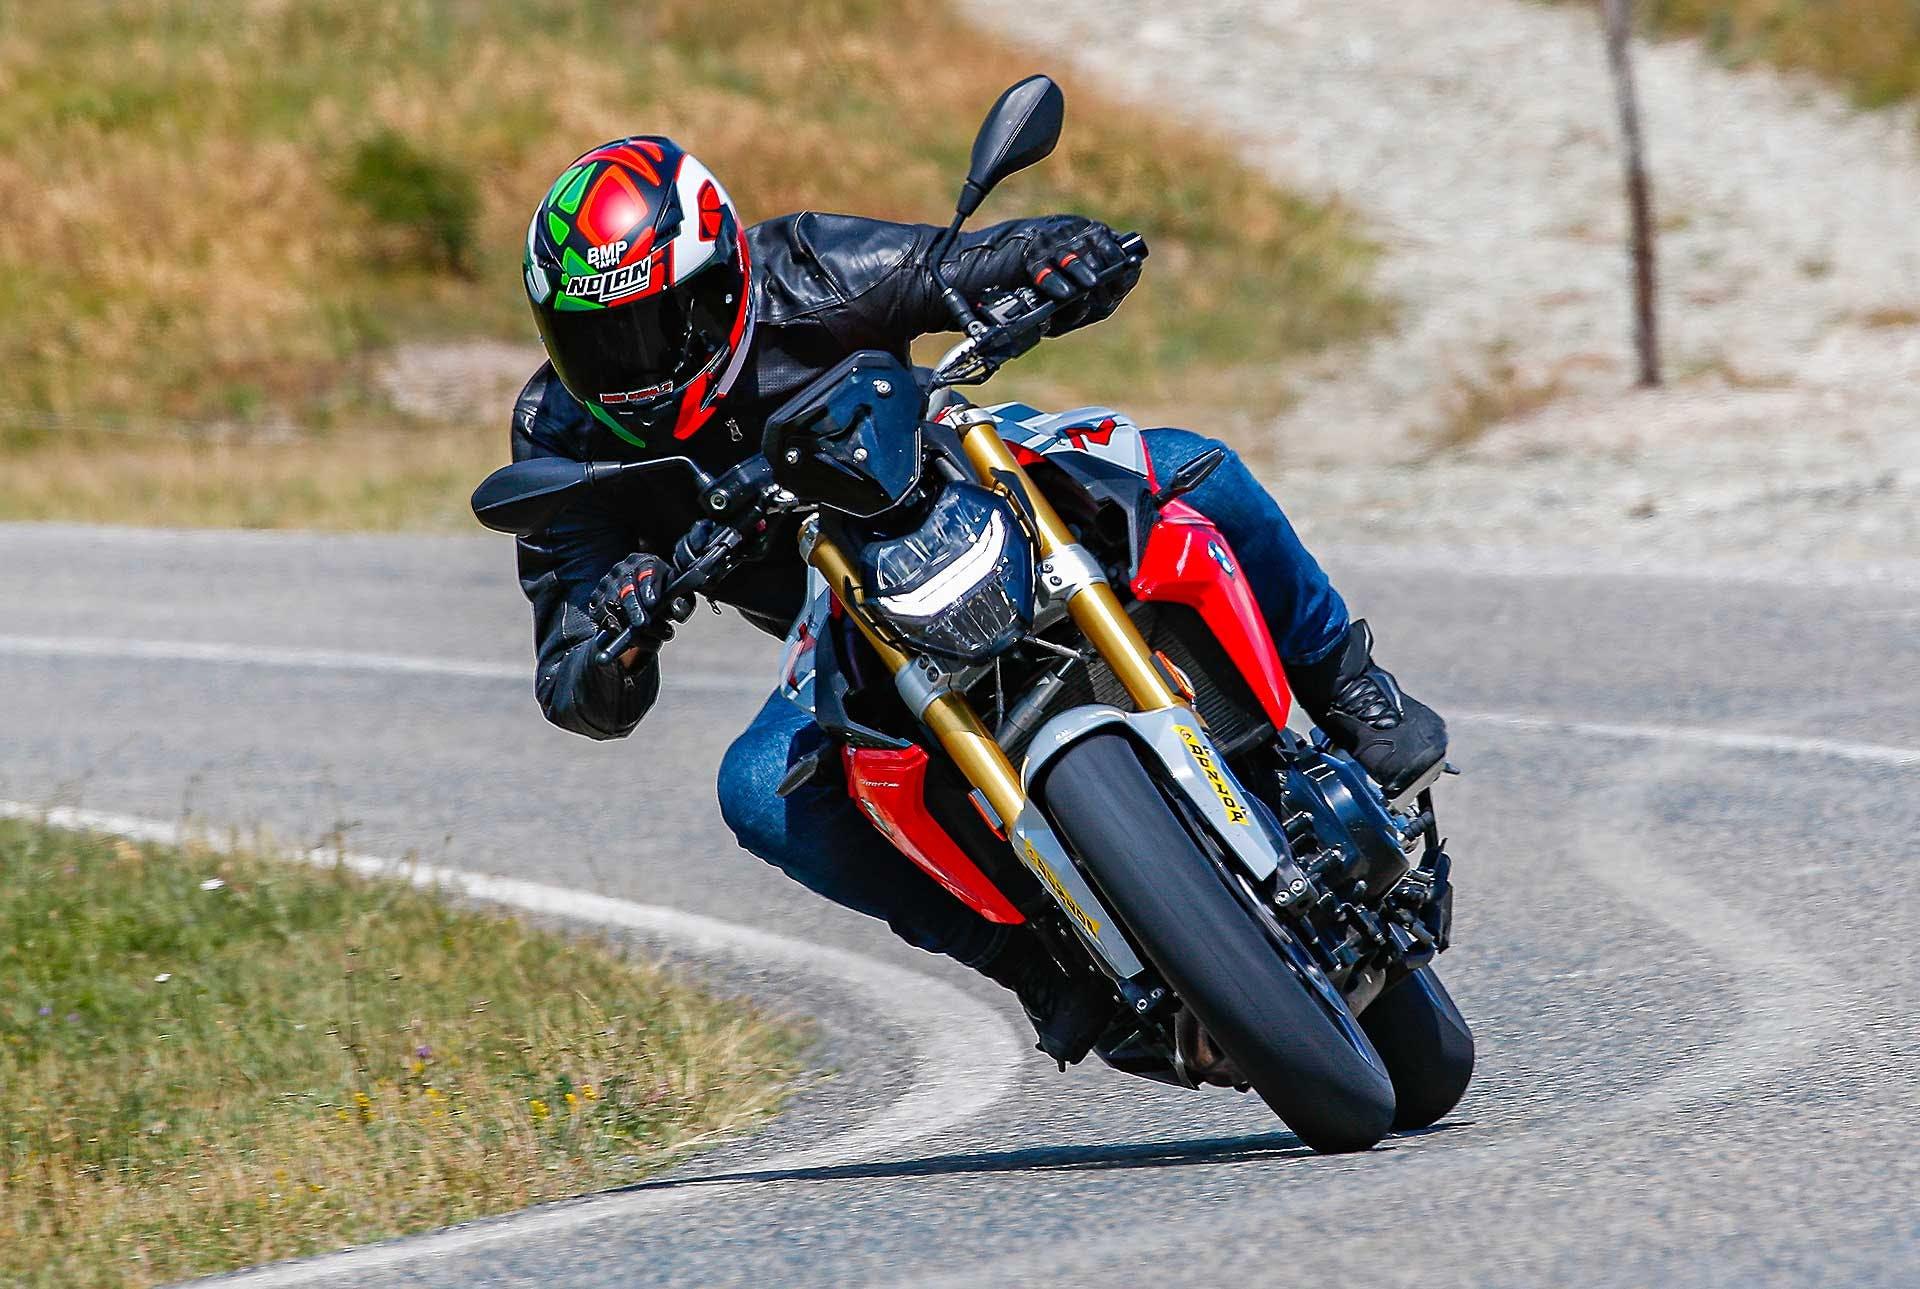 BMW F 900 R 2021 Migliori moto naked